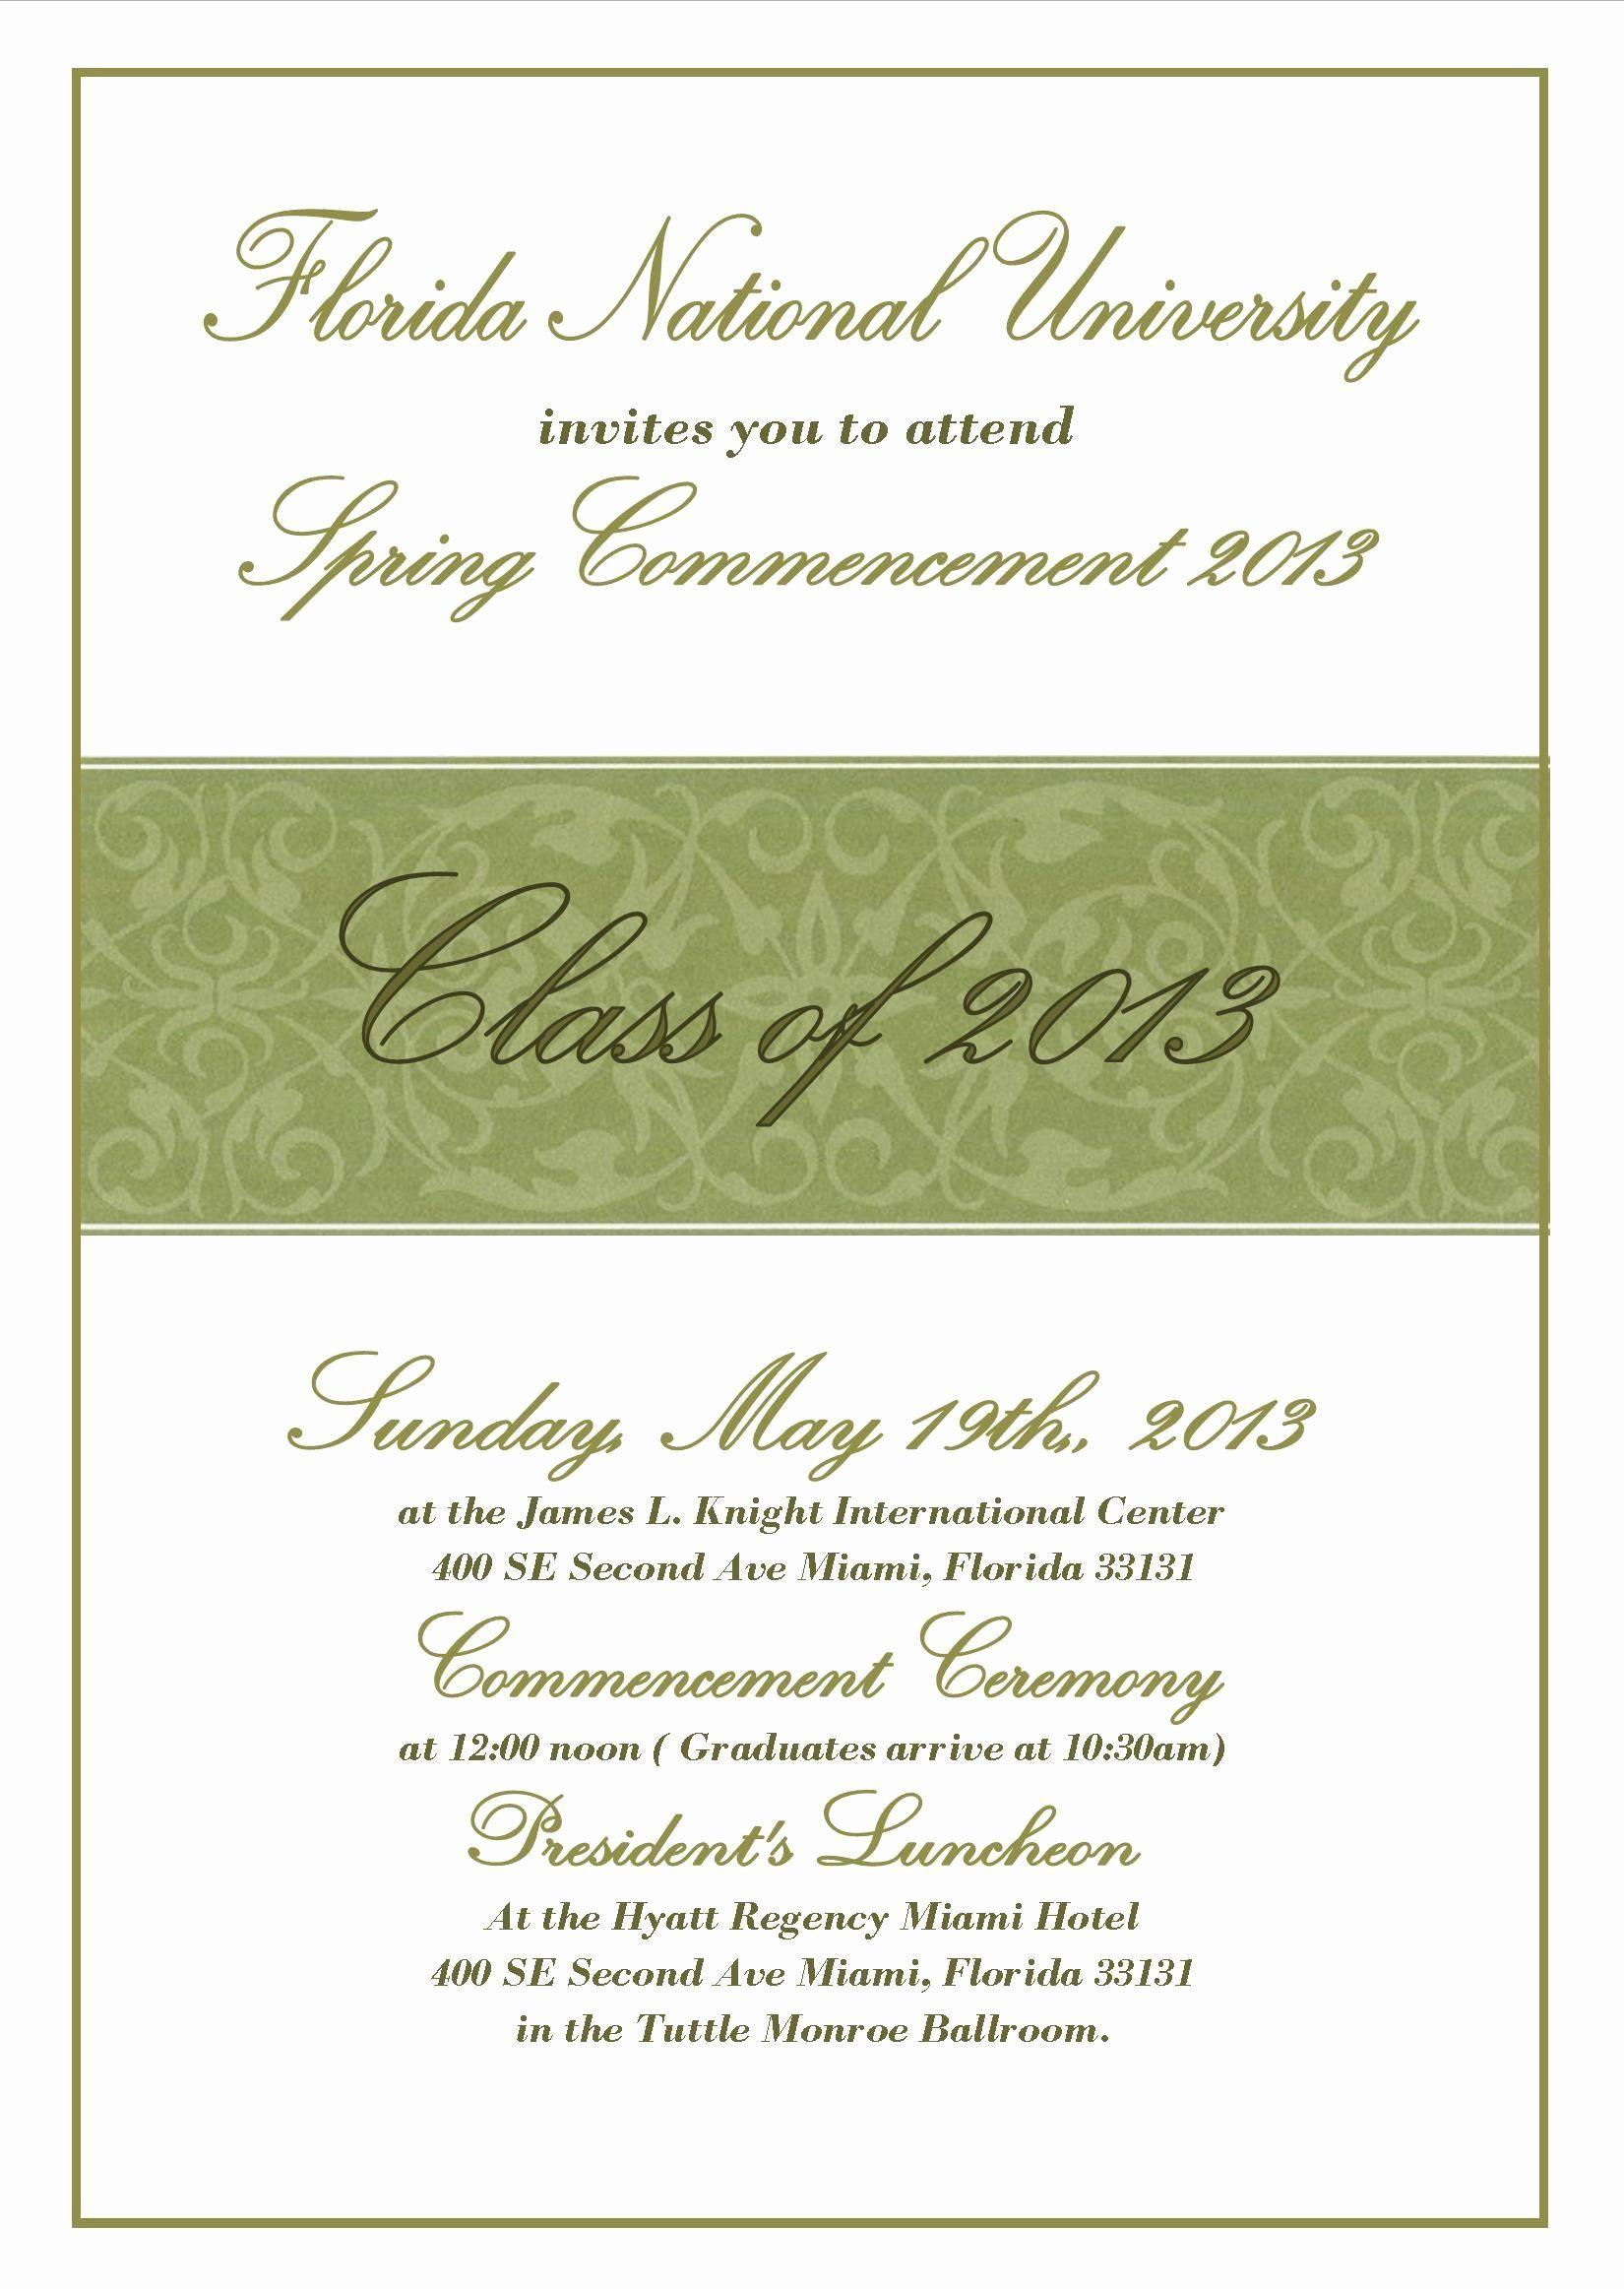 Examples Of Graduation Announcements Unique University Mencement In 2020 Graduation Invitation Wording Graduation Party Invitations Templates Invitation Templates Word